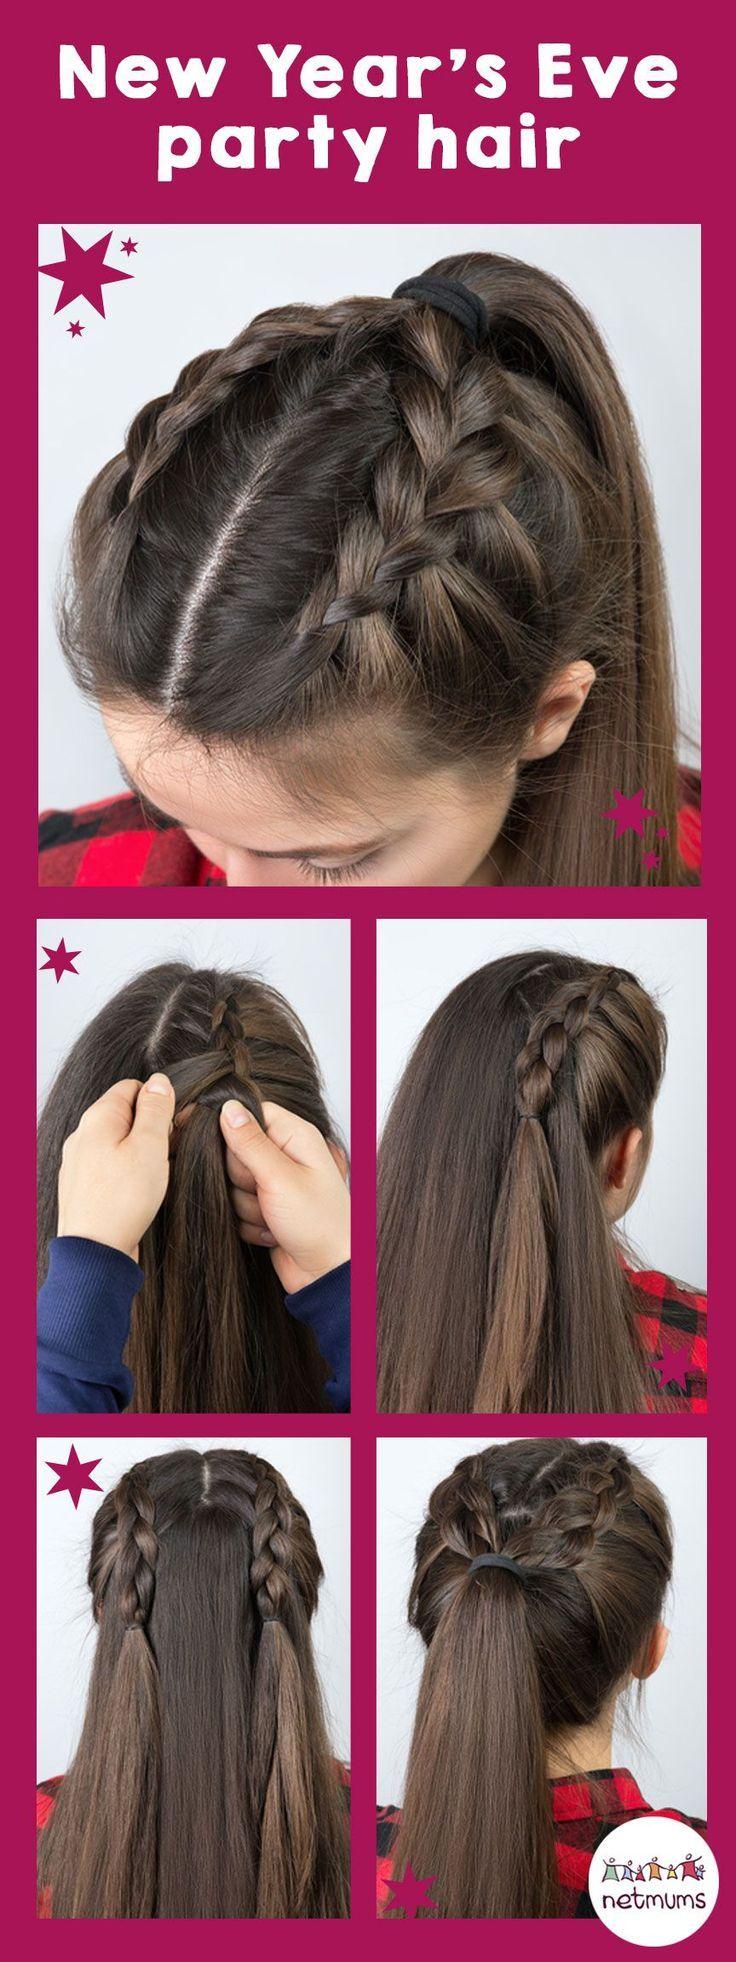 Simple Hair Tutorials